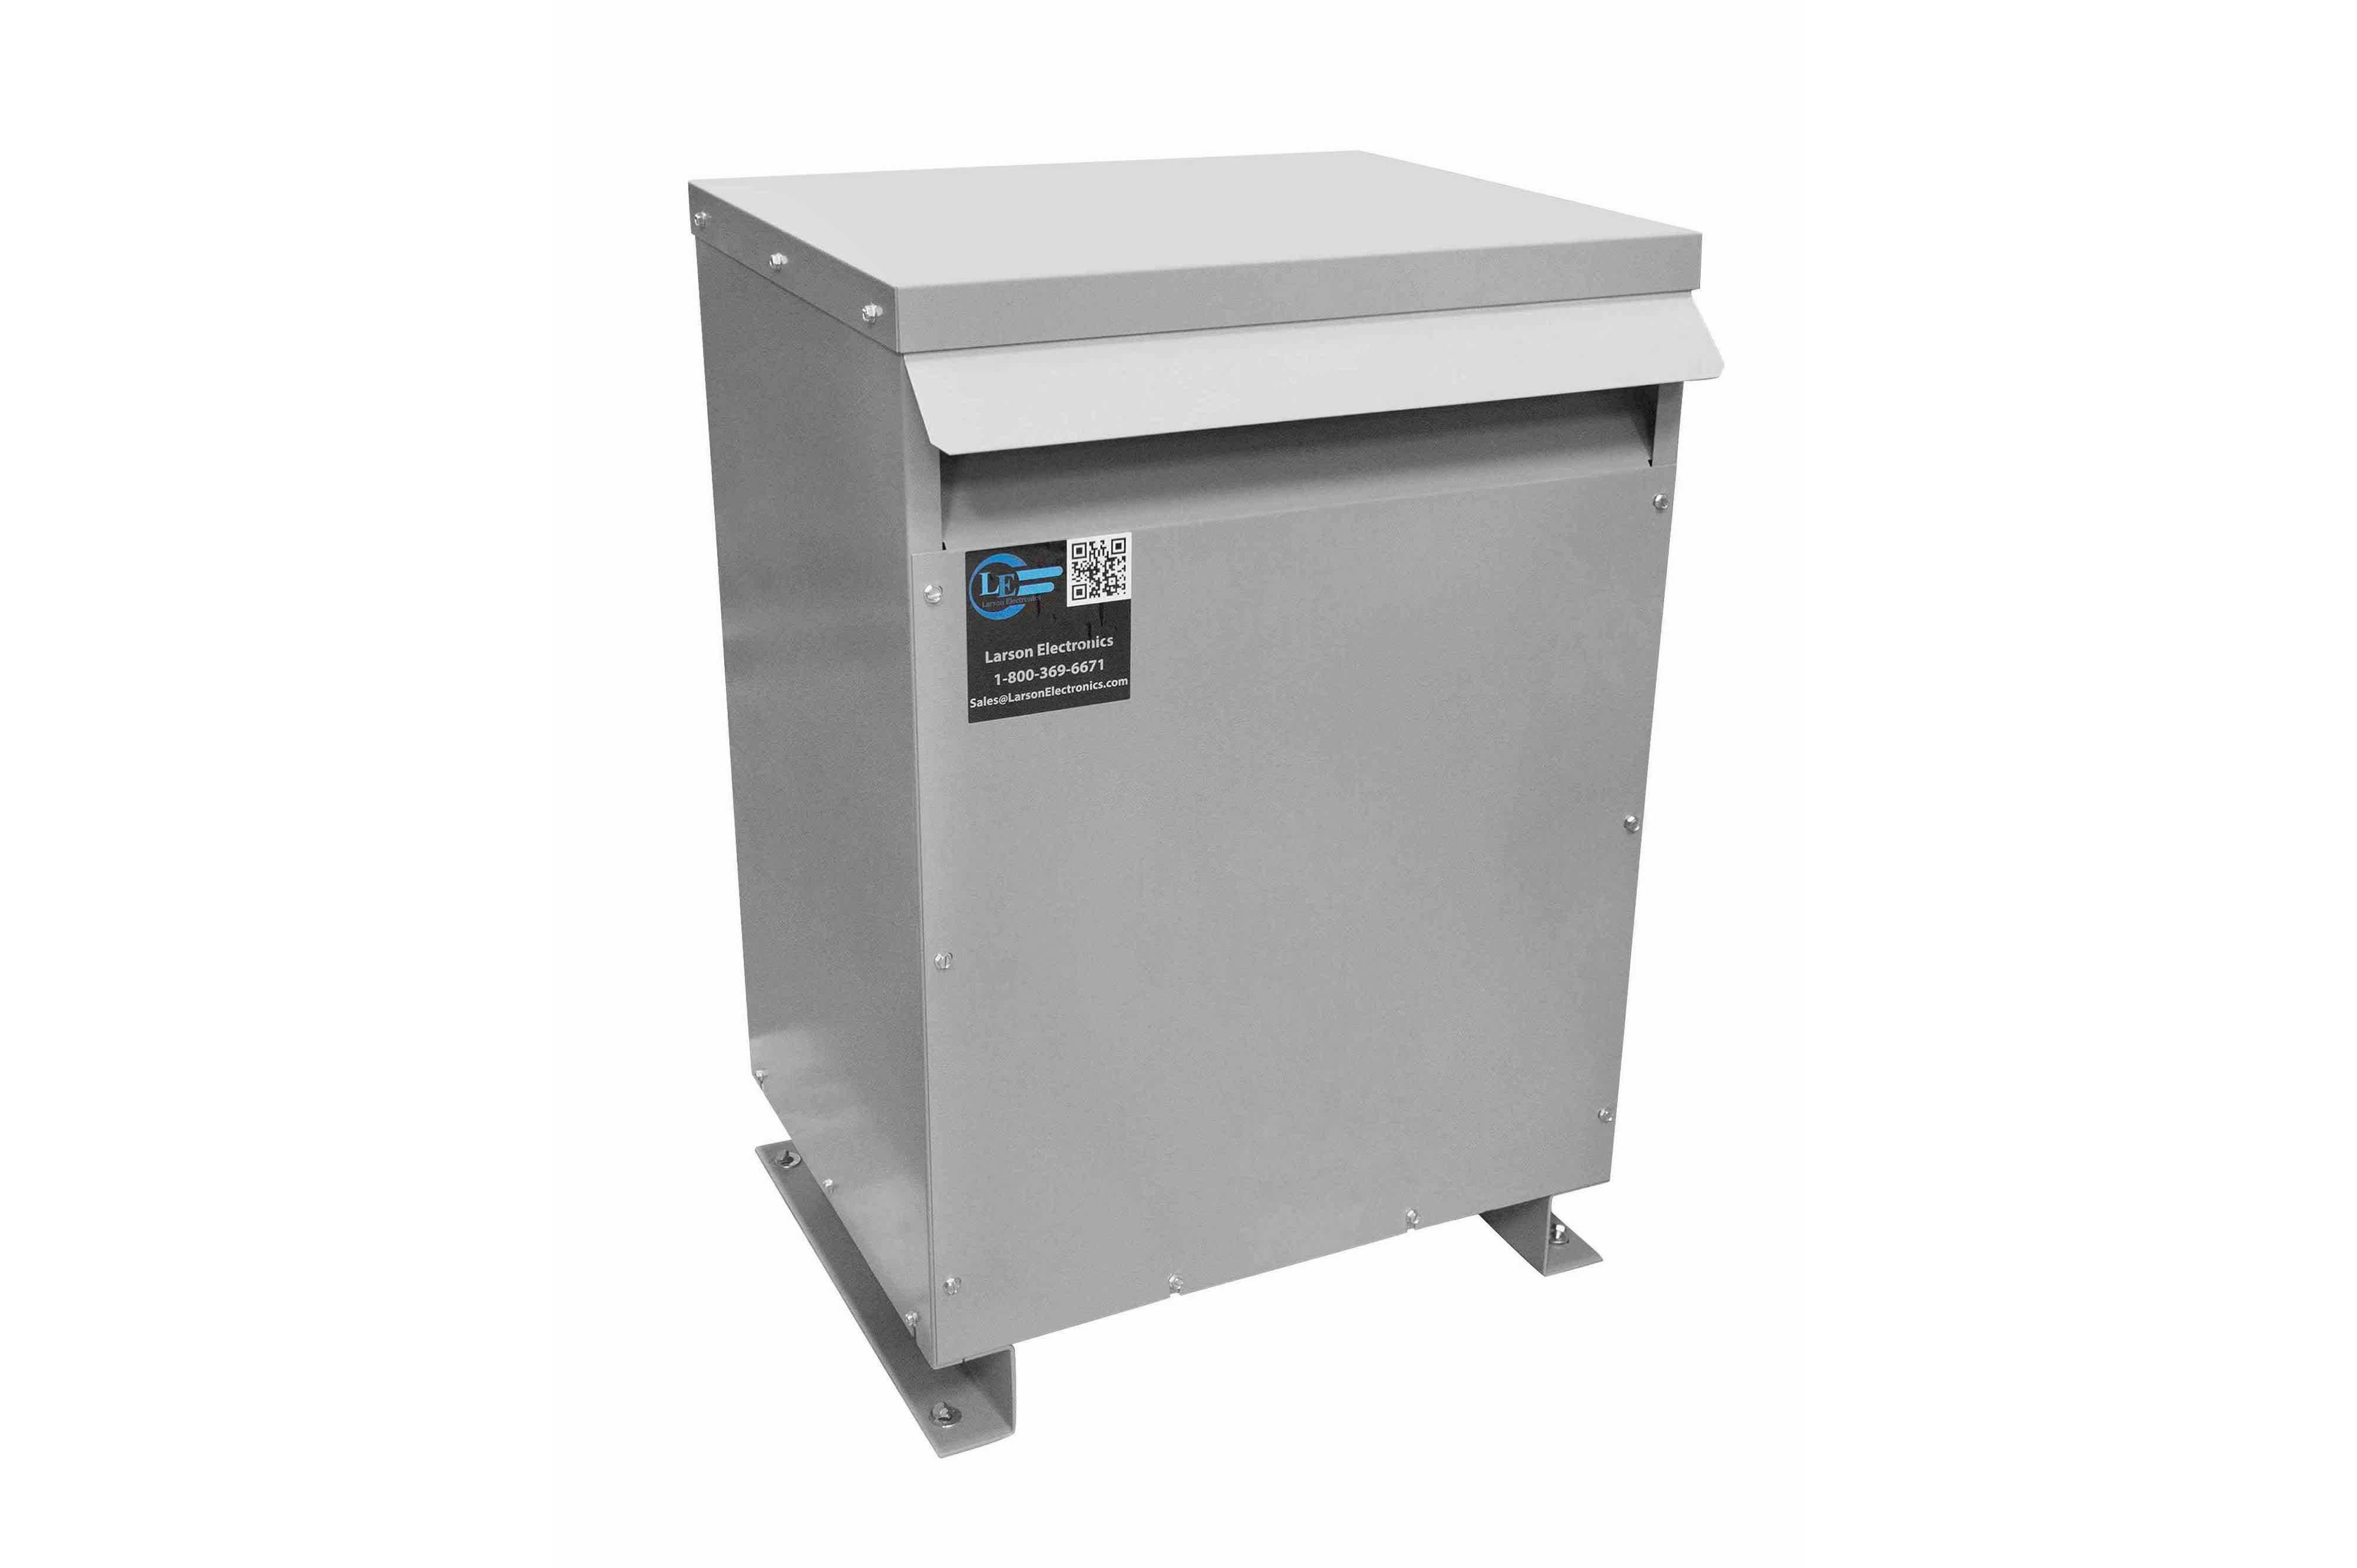 275 kVA 3PH Isolation Transformer, 400V Wye Primary, 480Y/277 Wye-N Secondary, N3R, Ventilated, 60 Hz